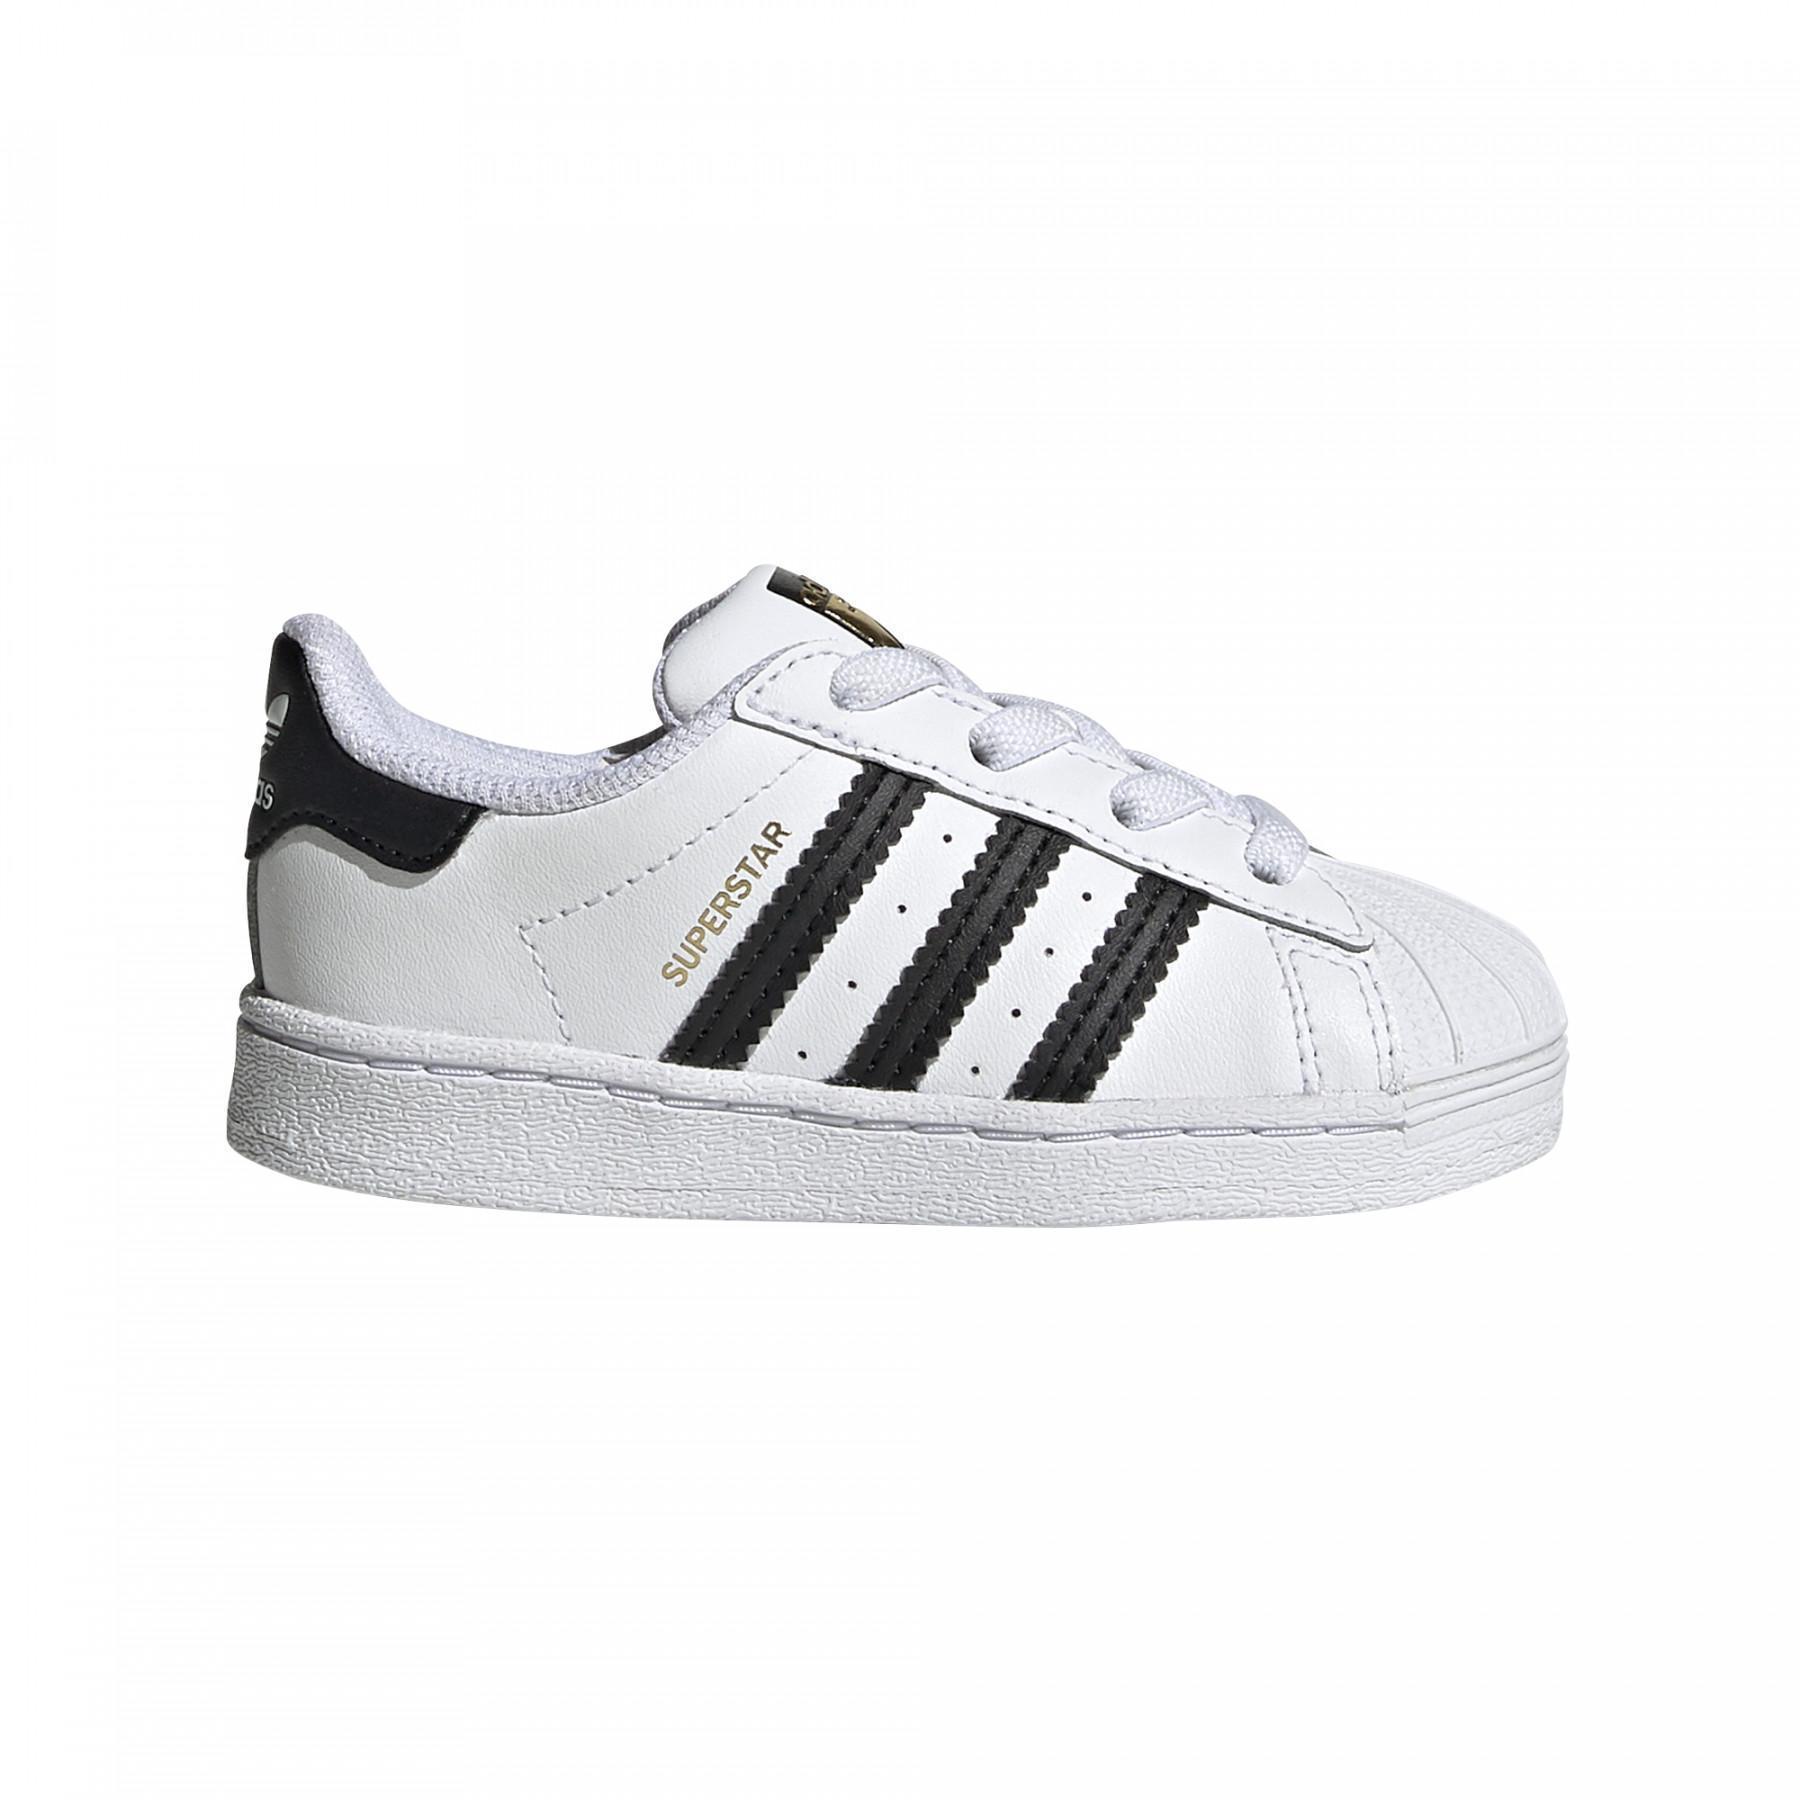 adidas Originals Superstar Kids Shoes